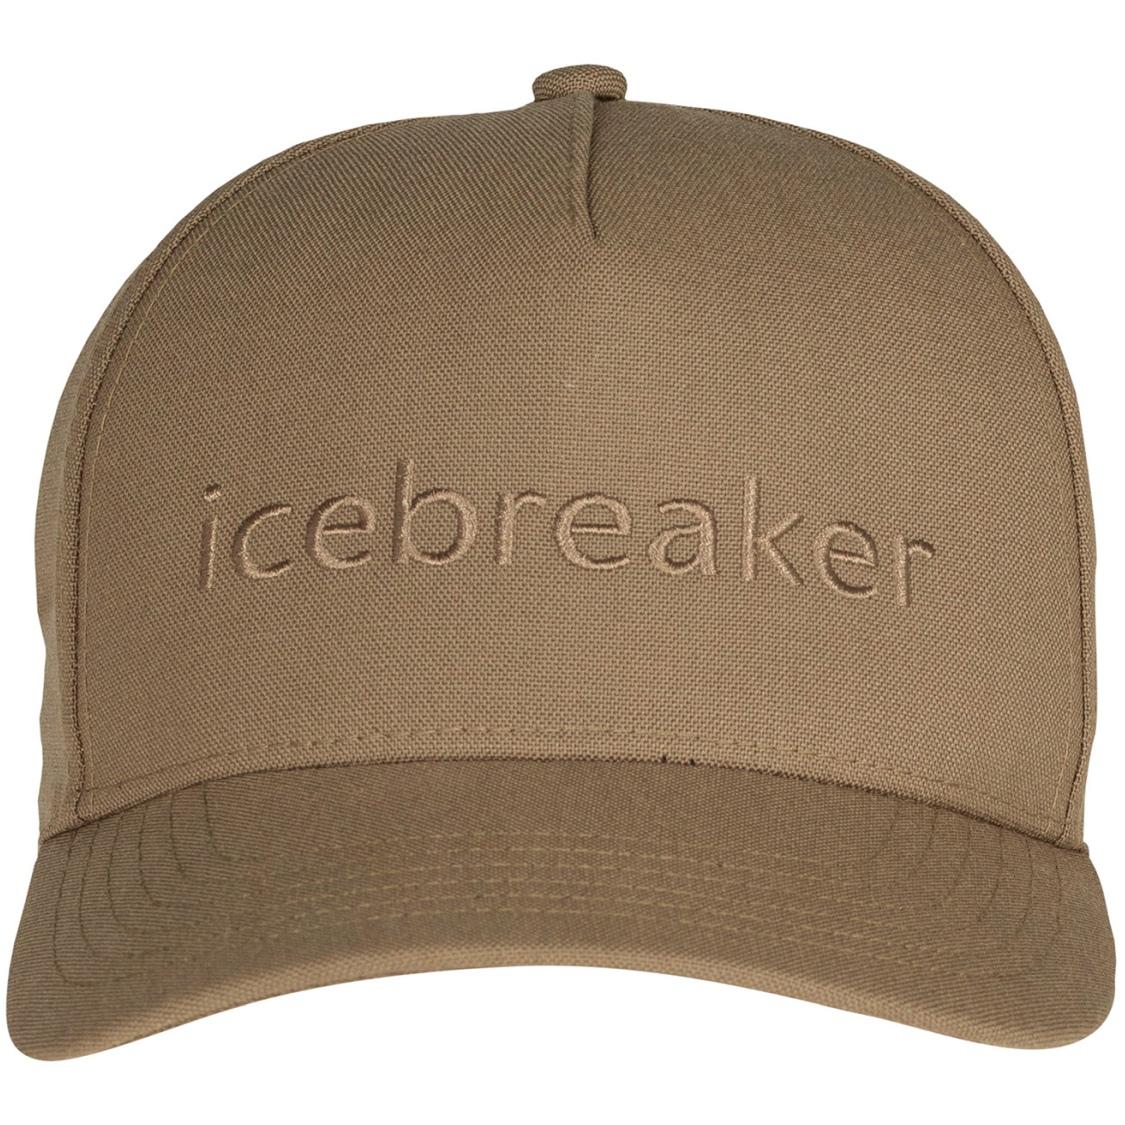 Produktbild von Icebreaker Logo Cap - Flint